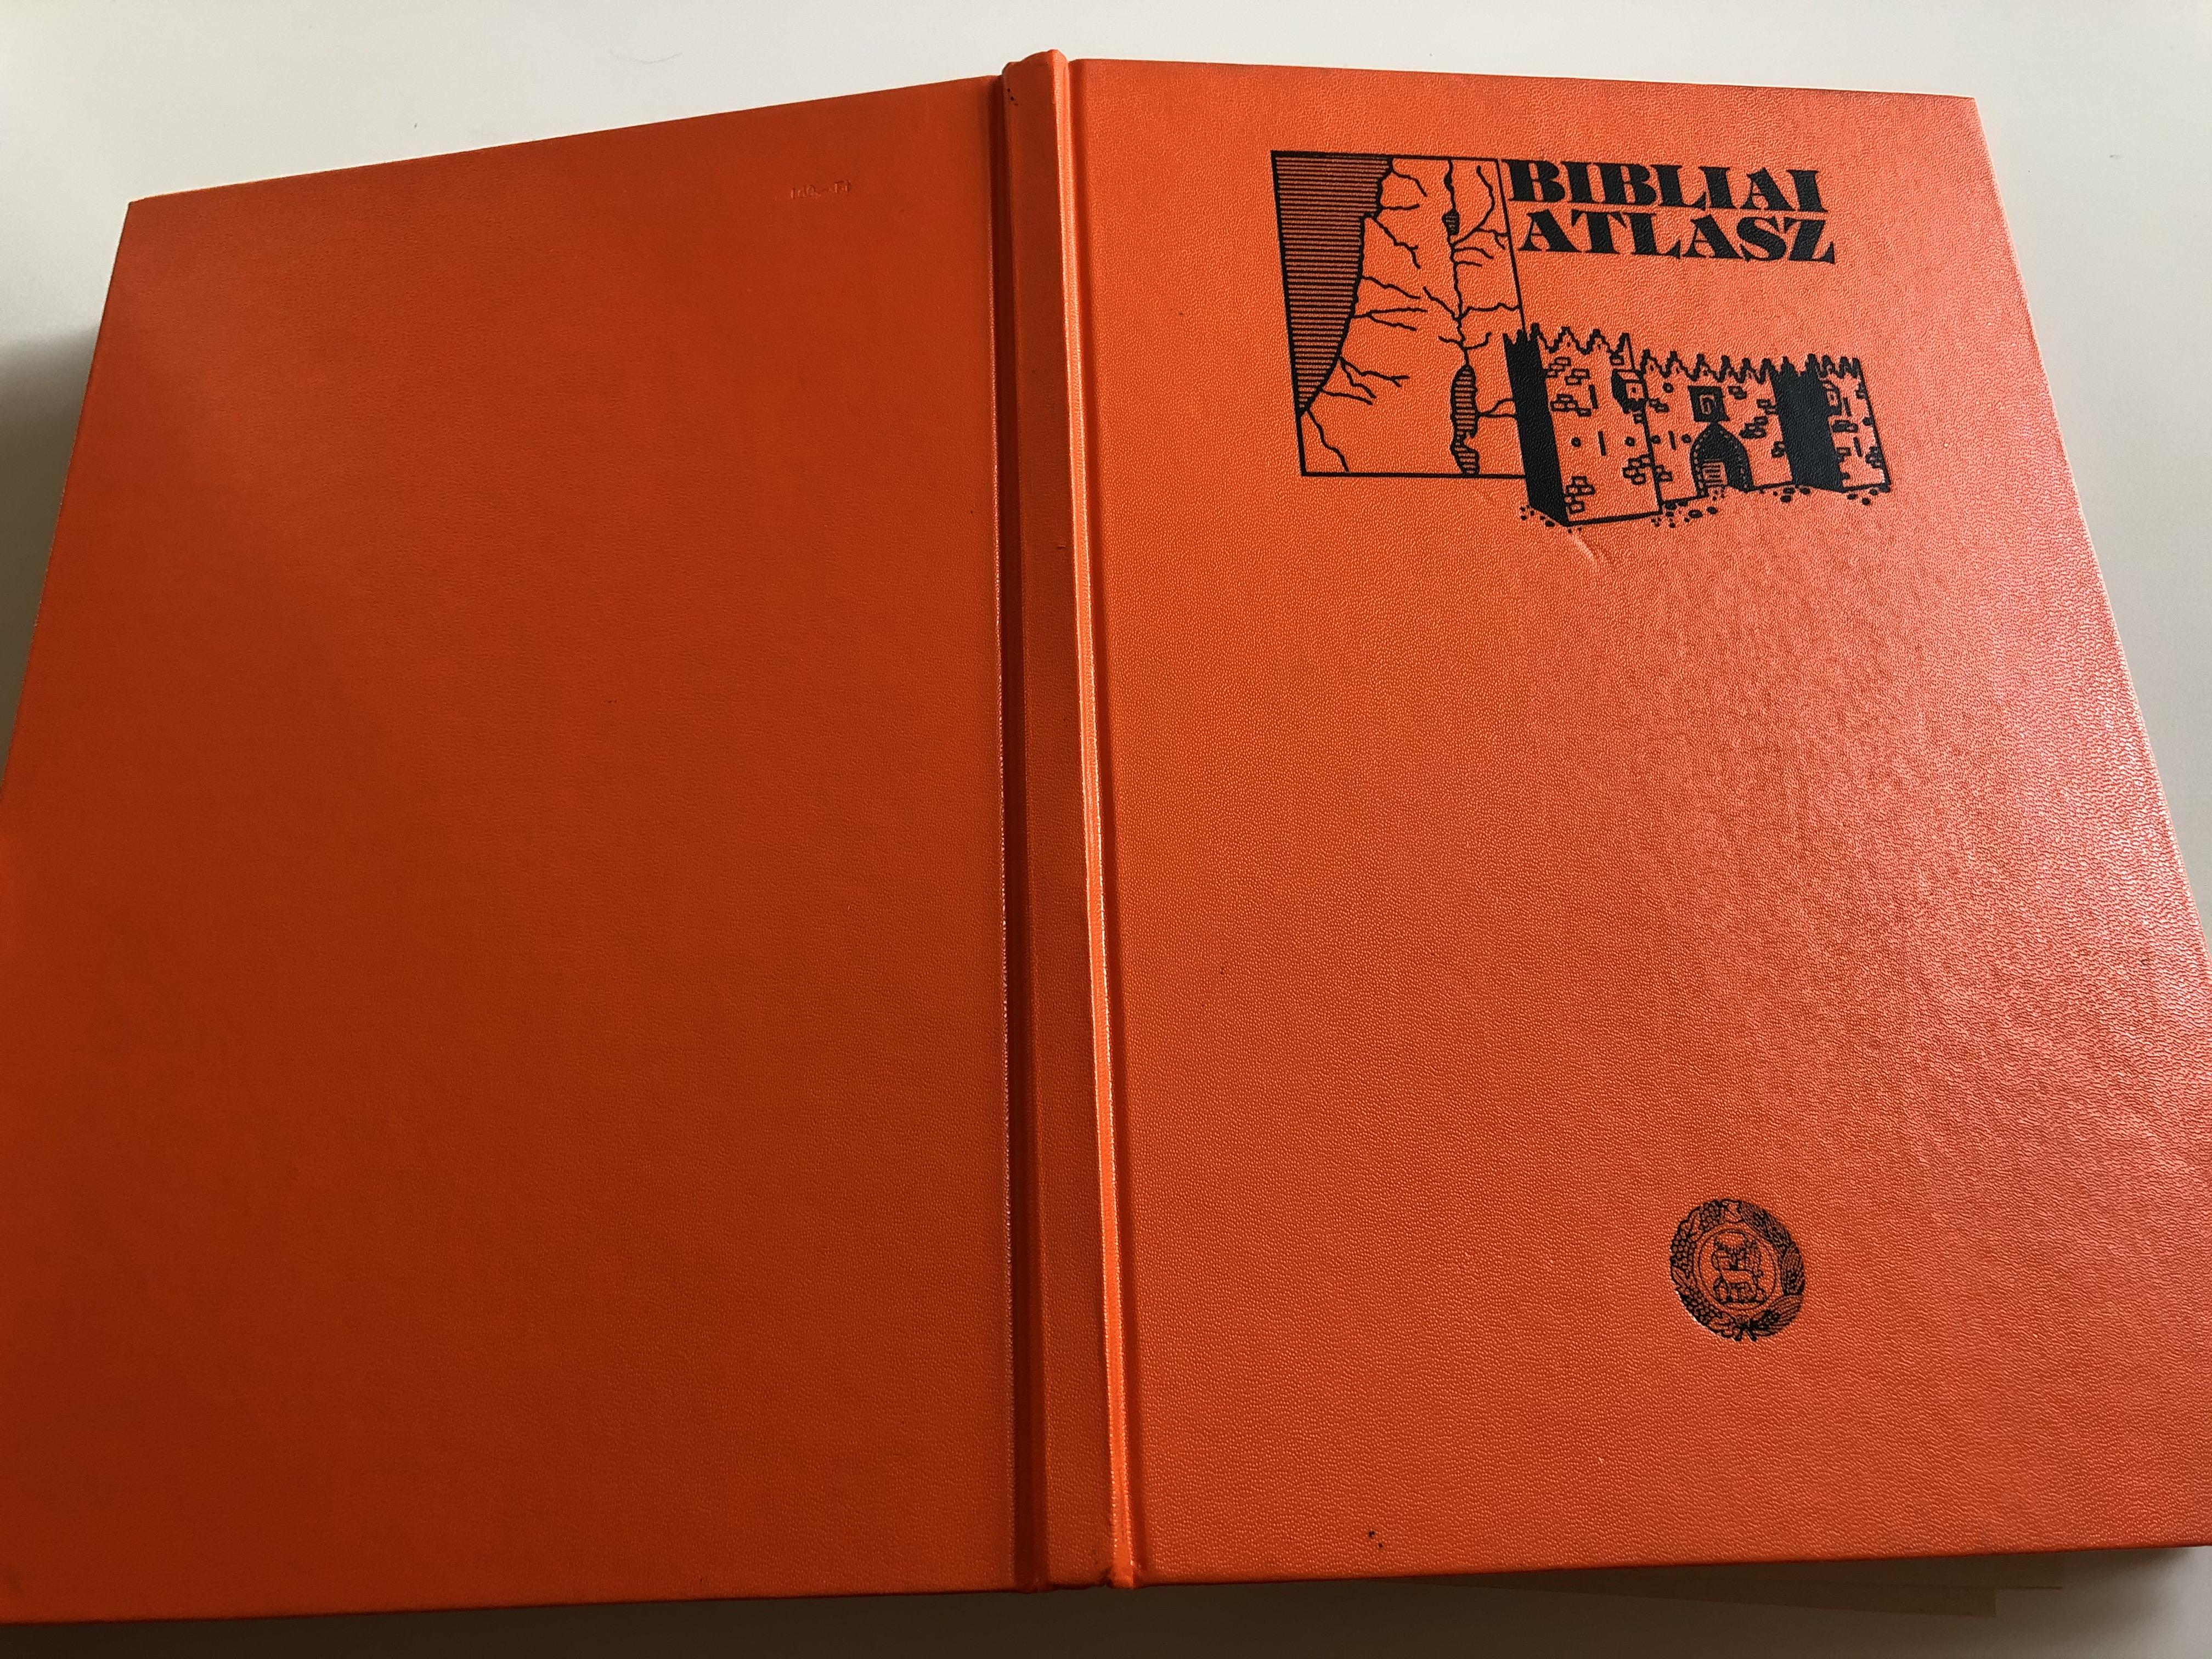 bibliai-atlasz-1991-hungarian-language-bible-atlas-19.jpg